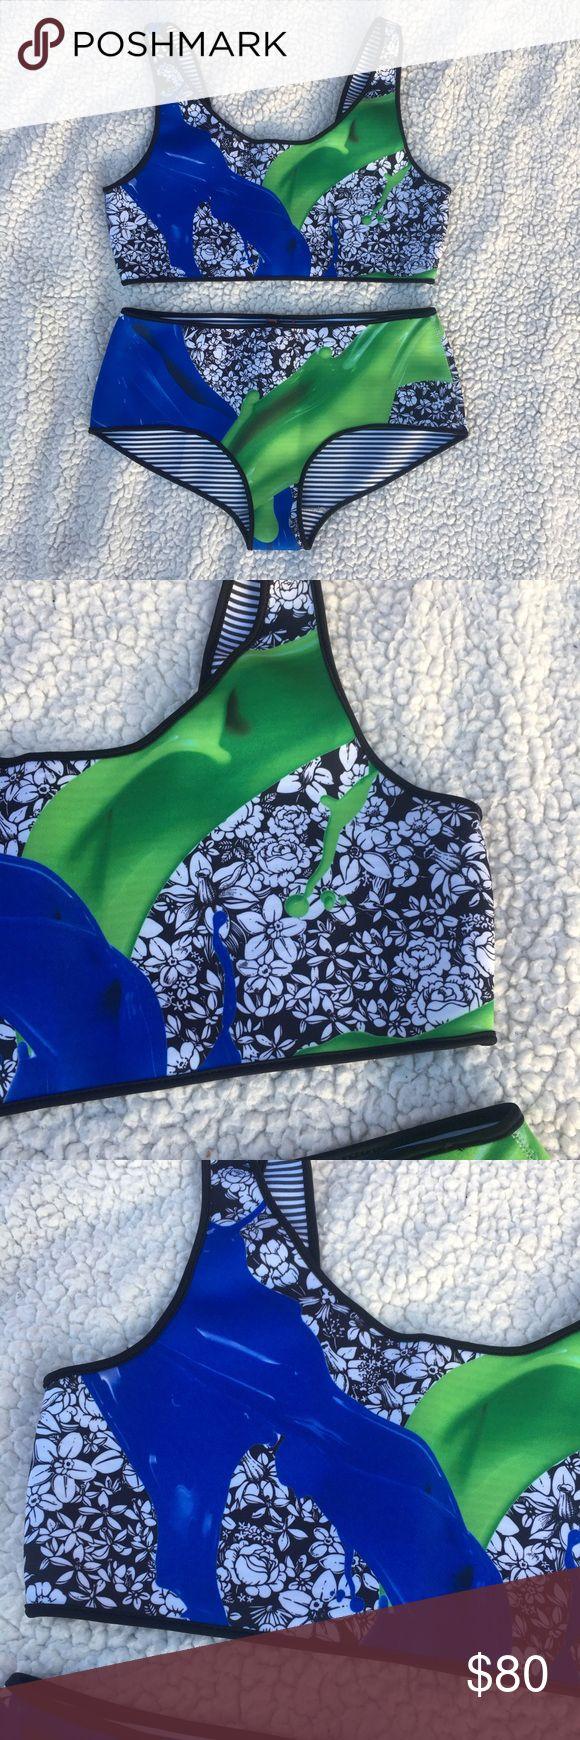 NWT Clover Canyon Blue and Green Floral Bikini Absolutely beautiful Clover Canyon bikini. NWT. Size Large. Clover Canyon Swim Bikinis